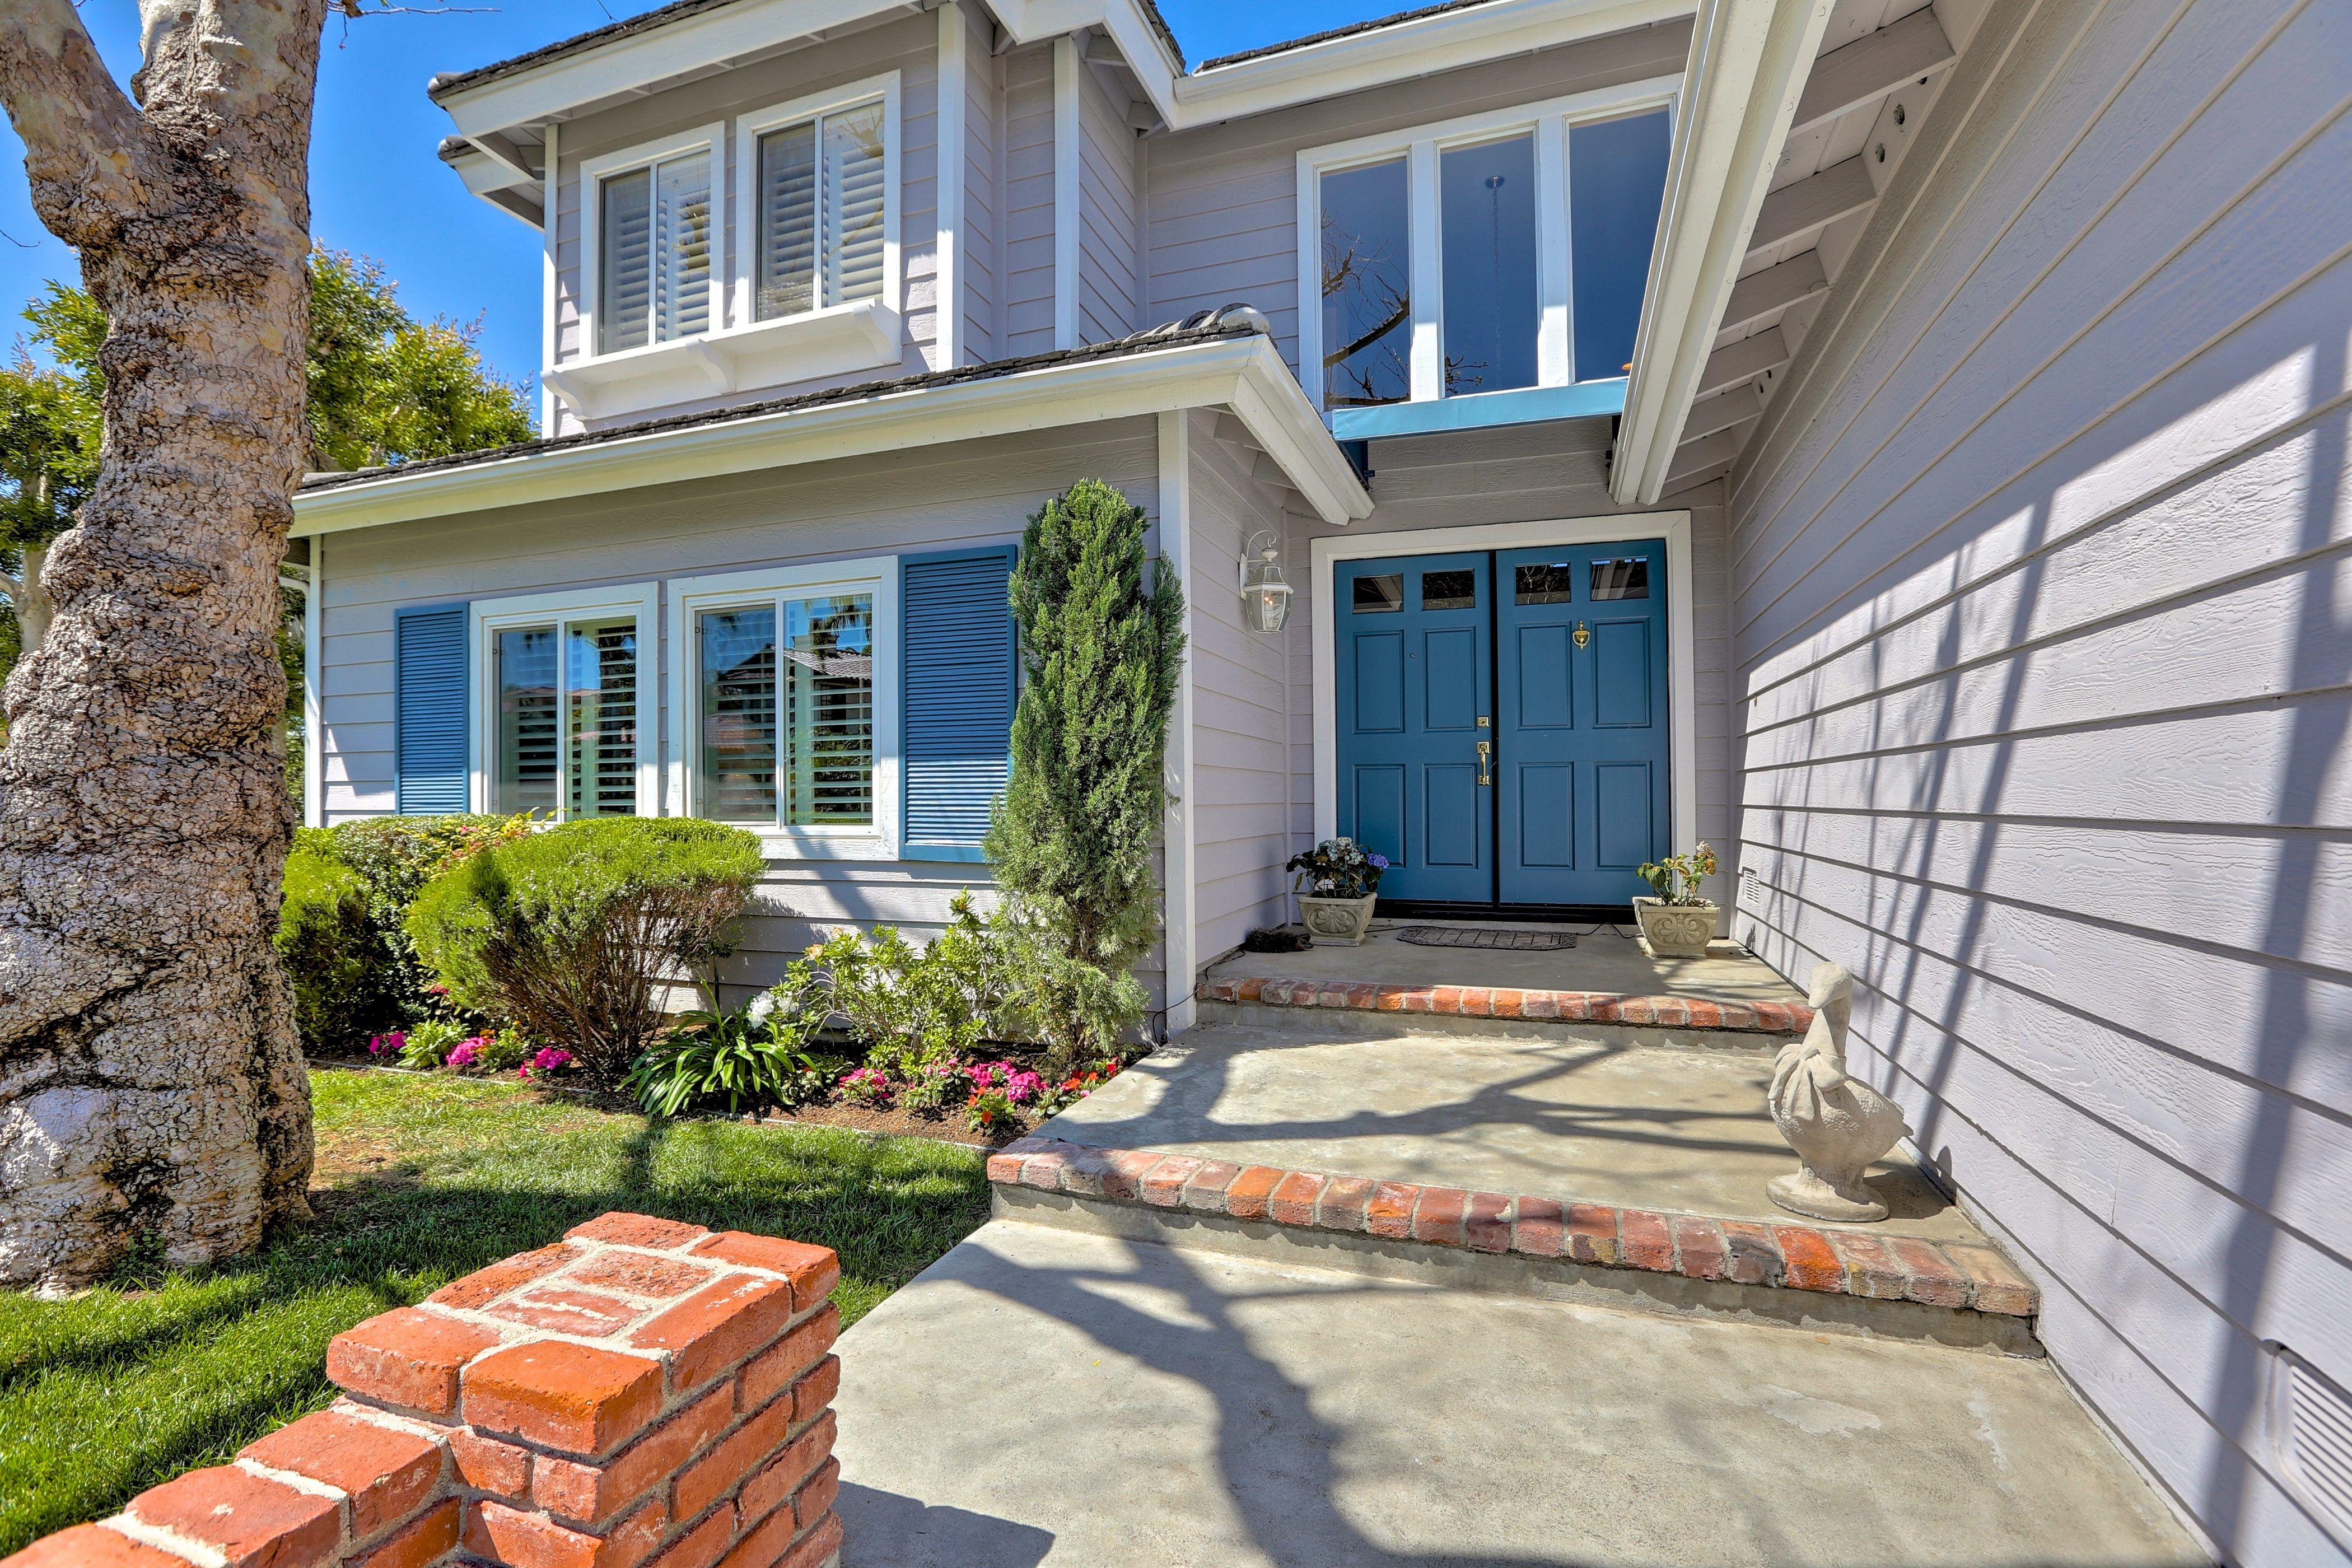 700 Calle Monserrat, San Clemente Property Listing: MLS® #OC15065814